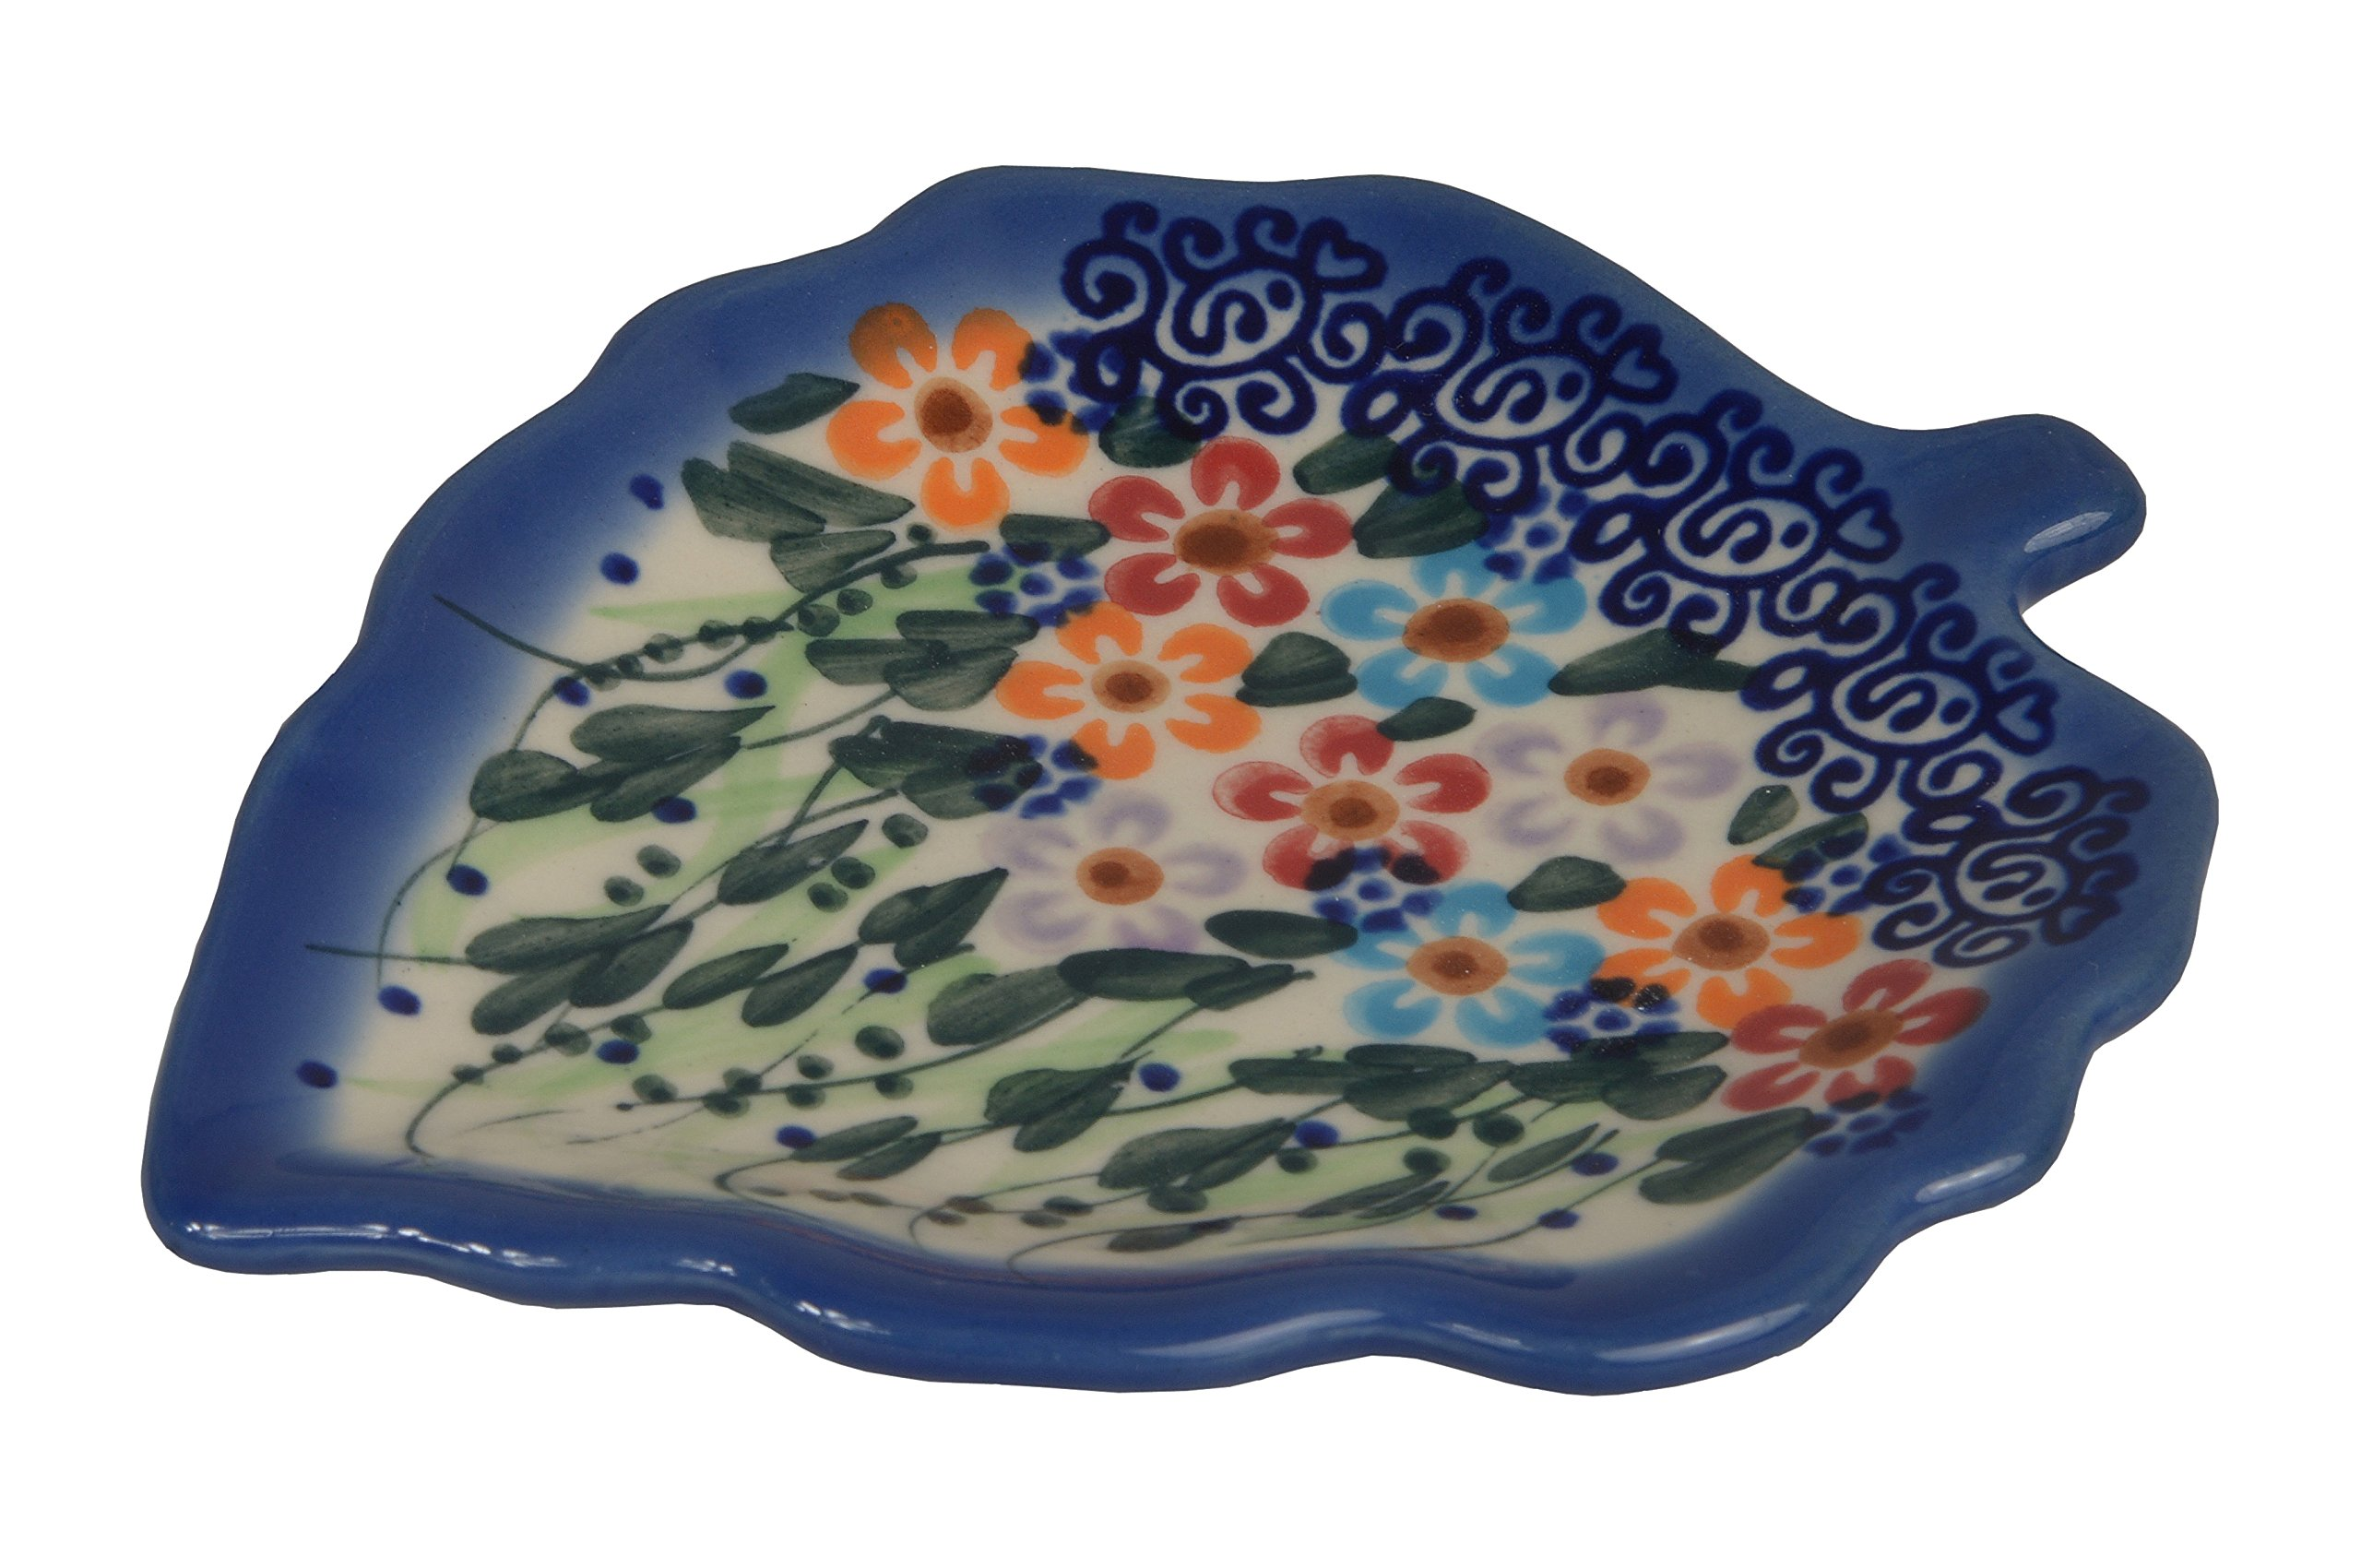 Traditional Polish Pottery, Handcrafted Ceramic Leaf-Shaped Tea Bag Coaster or Spoon Rest, L.12cm, Boleslawiec Style Pattern, H.401.Daisy